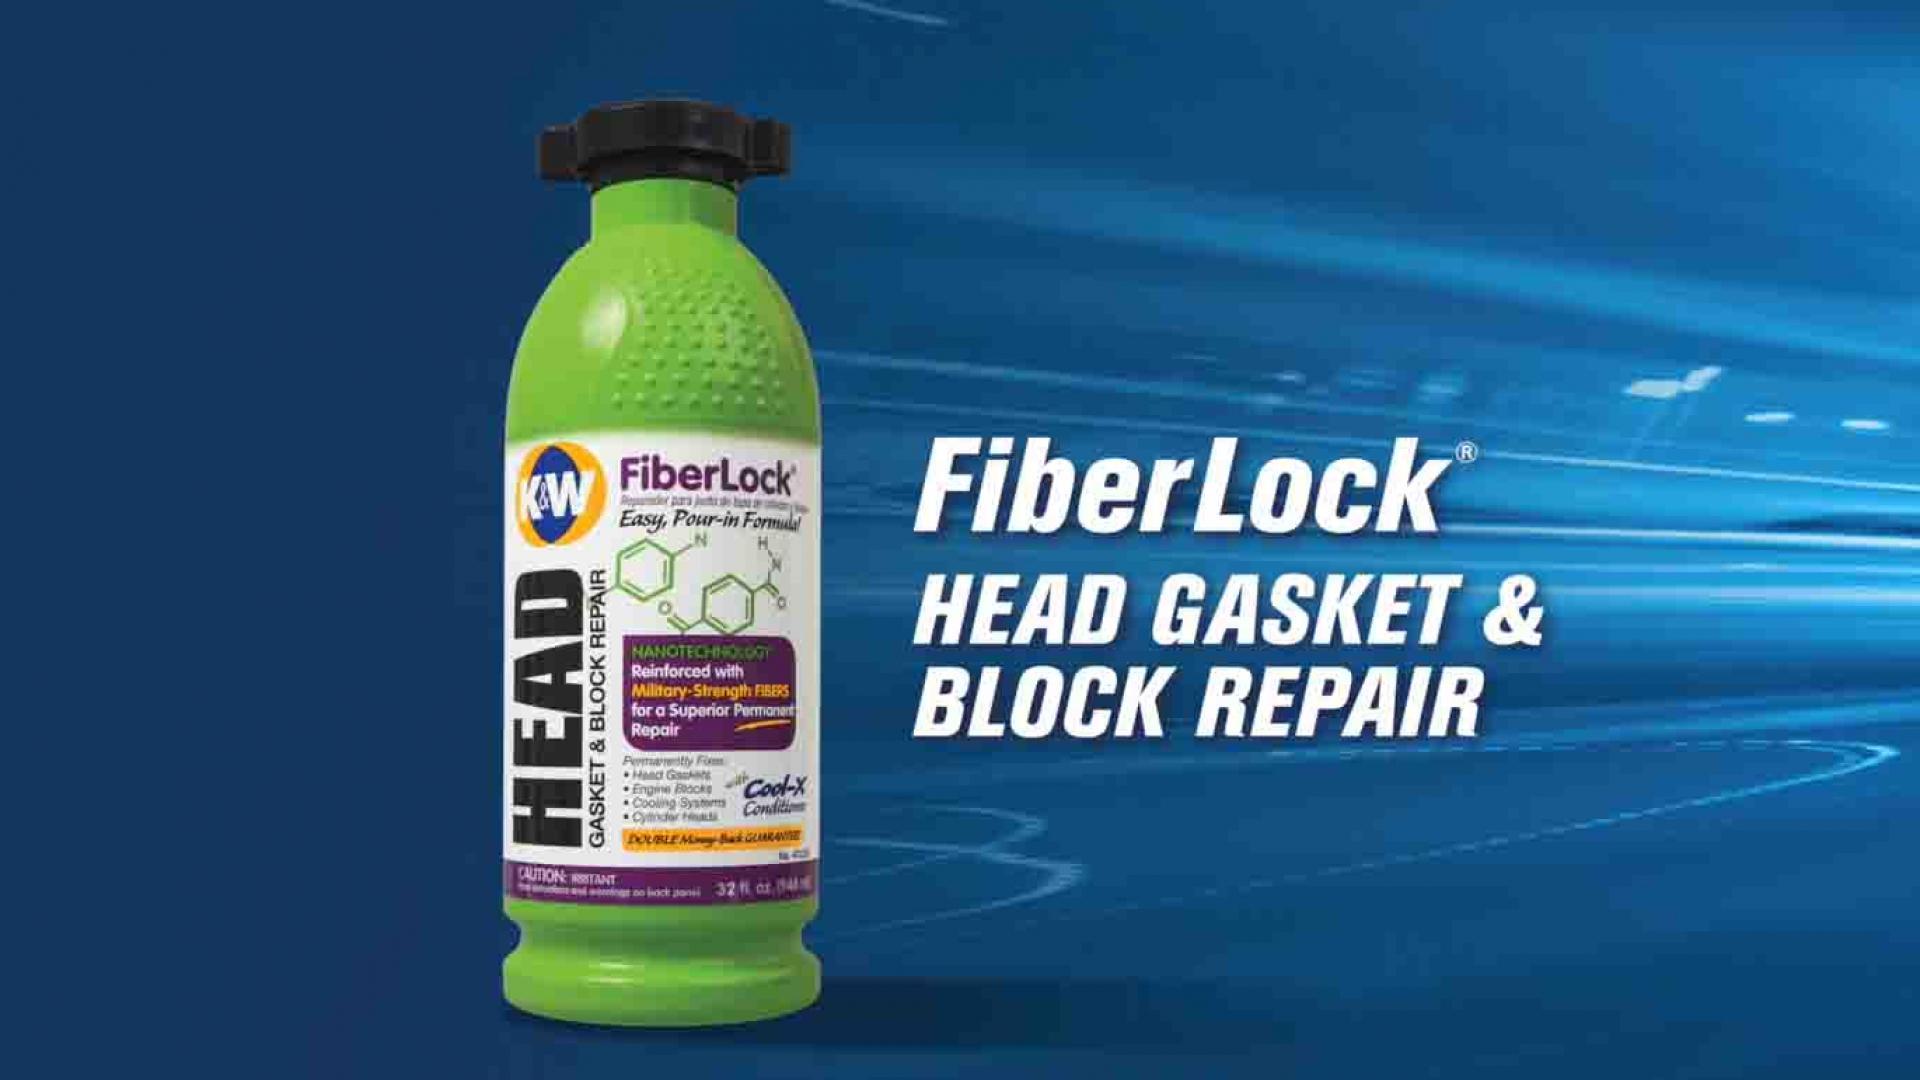 How to Use K&W FiberLock Head Gasket & Block Repair Tips about detecting a Cracked Head Gasket and how to use K&W® FiberLock® to fix it.